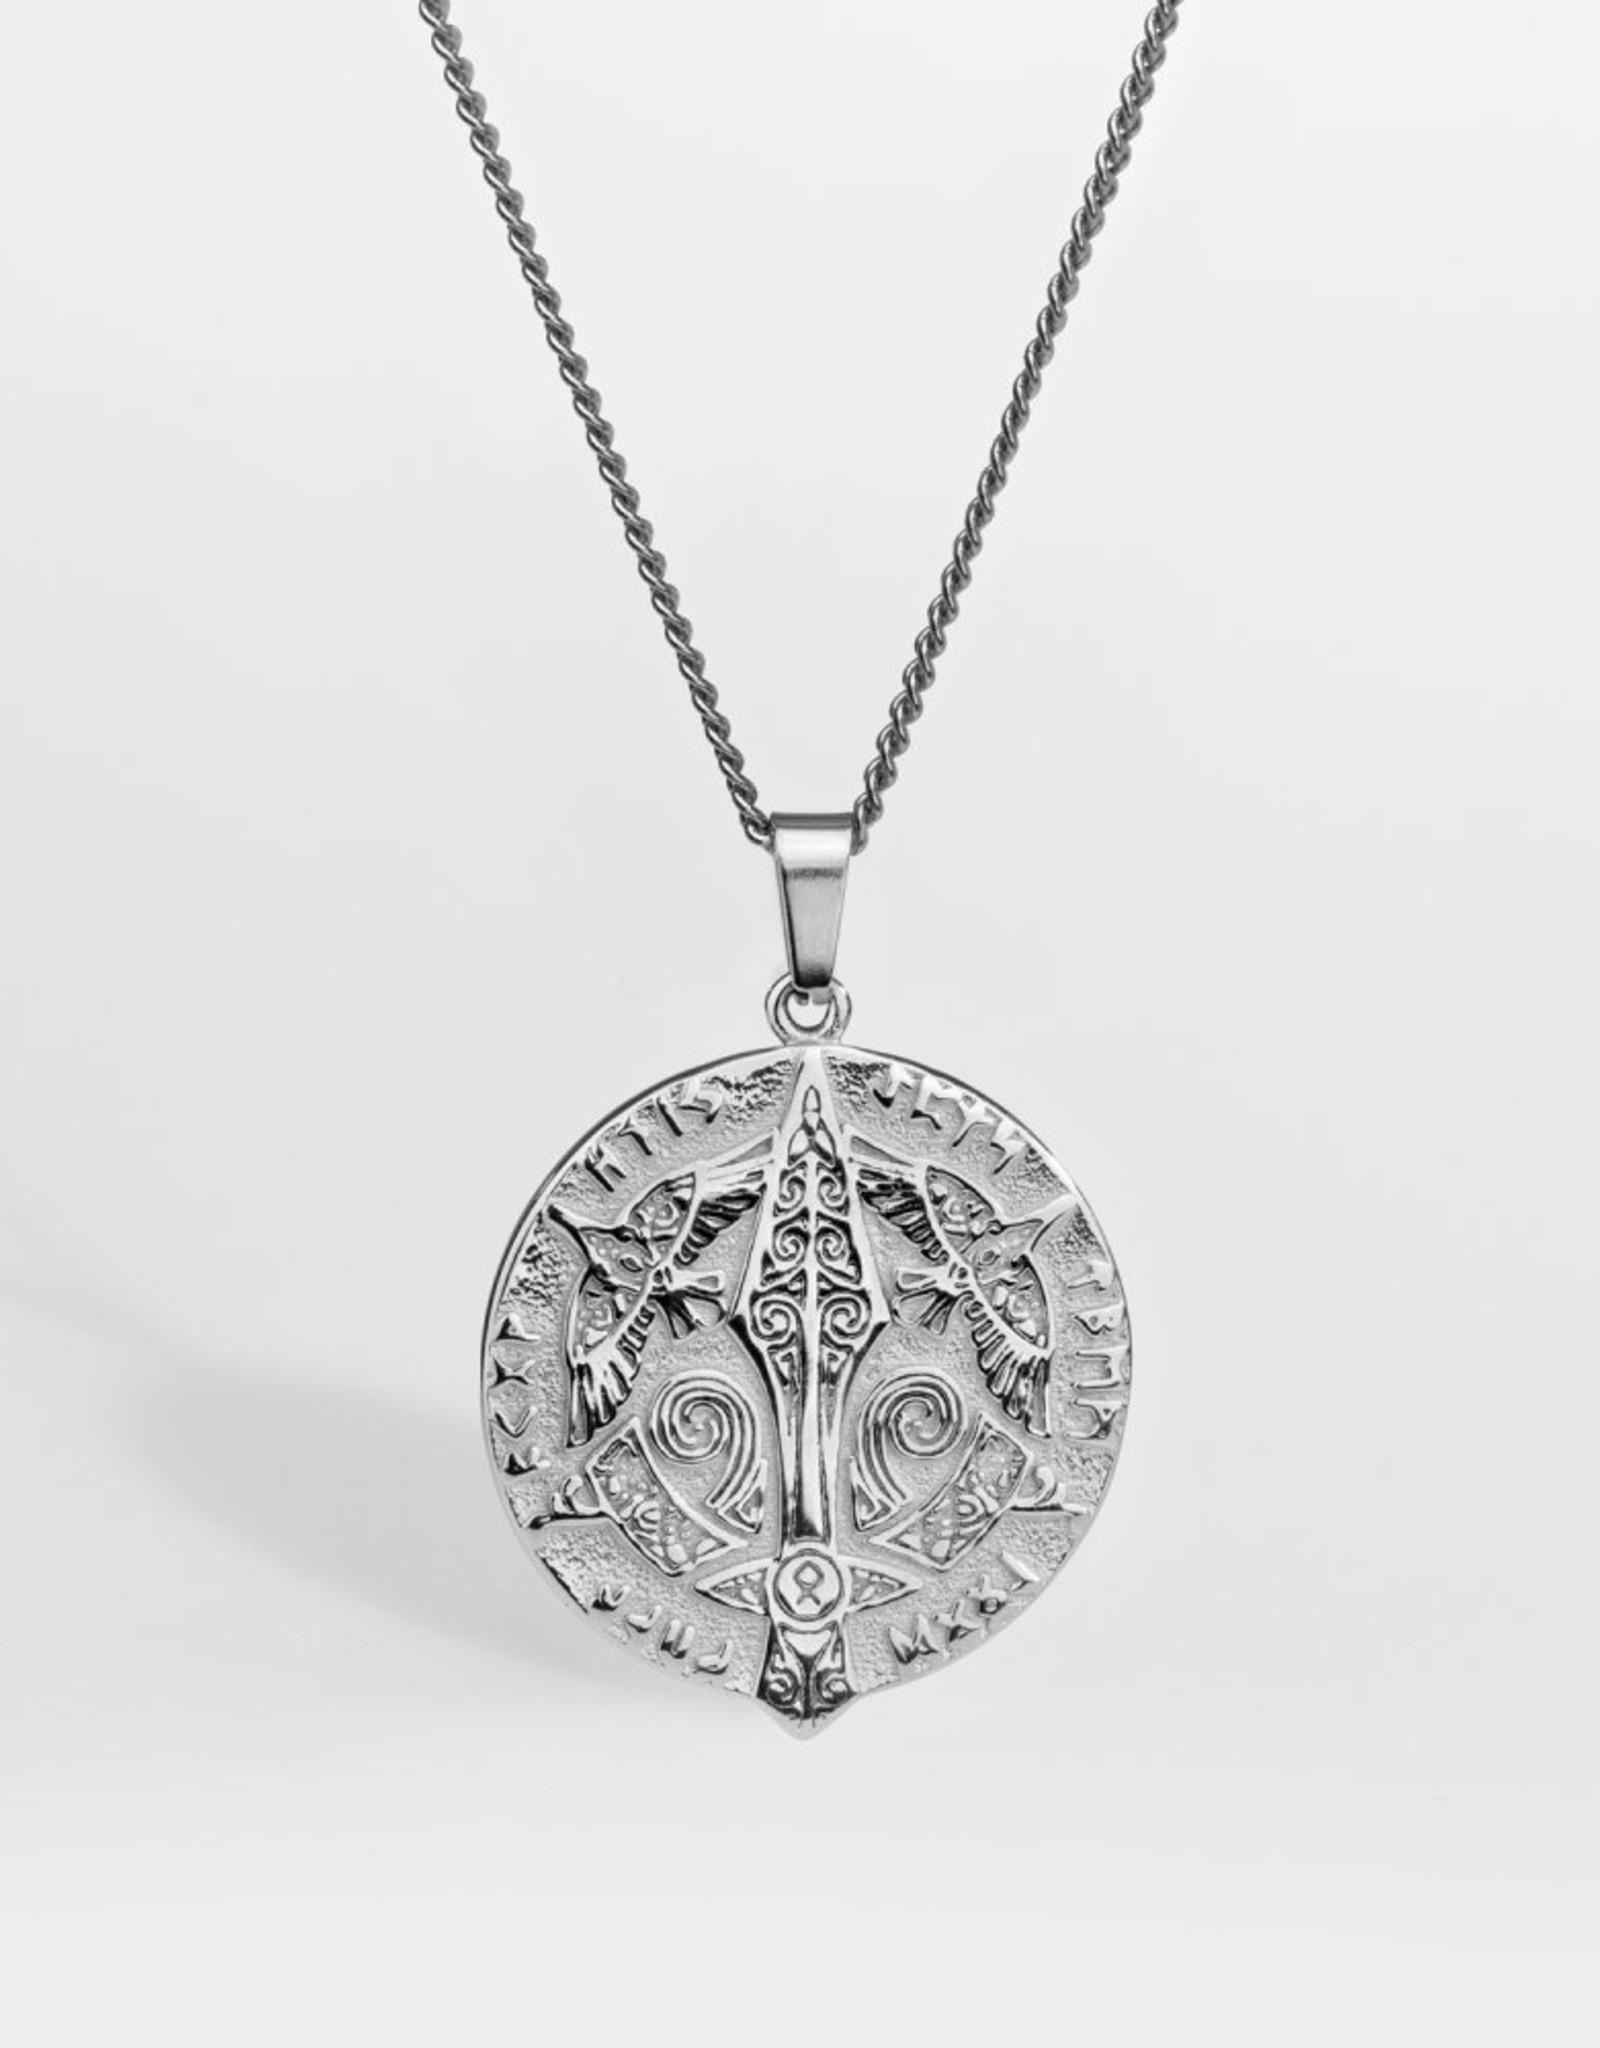 Northern Legacy NL Gungnir necklace- Silver Tone